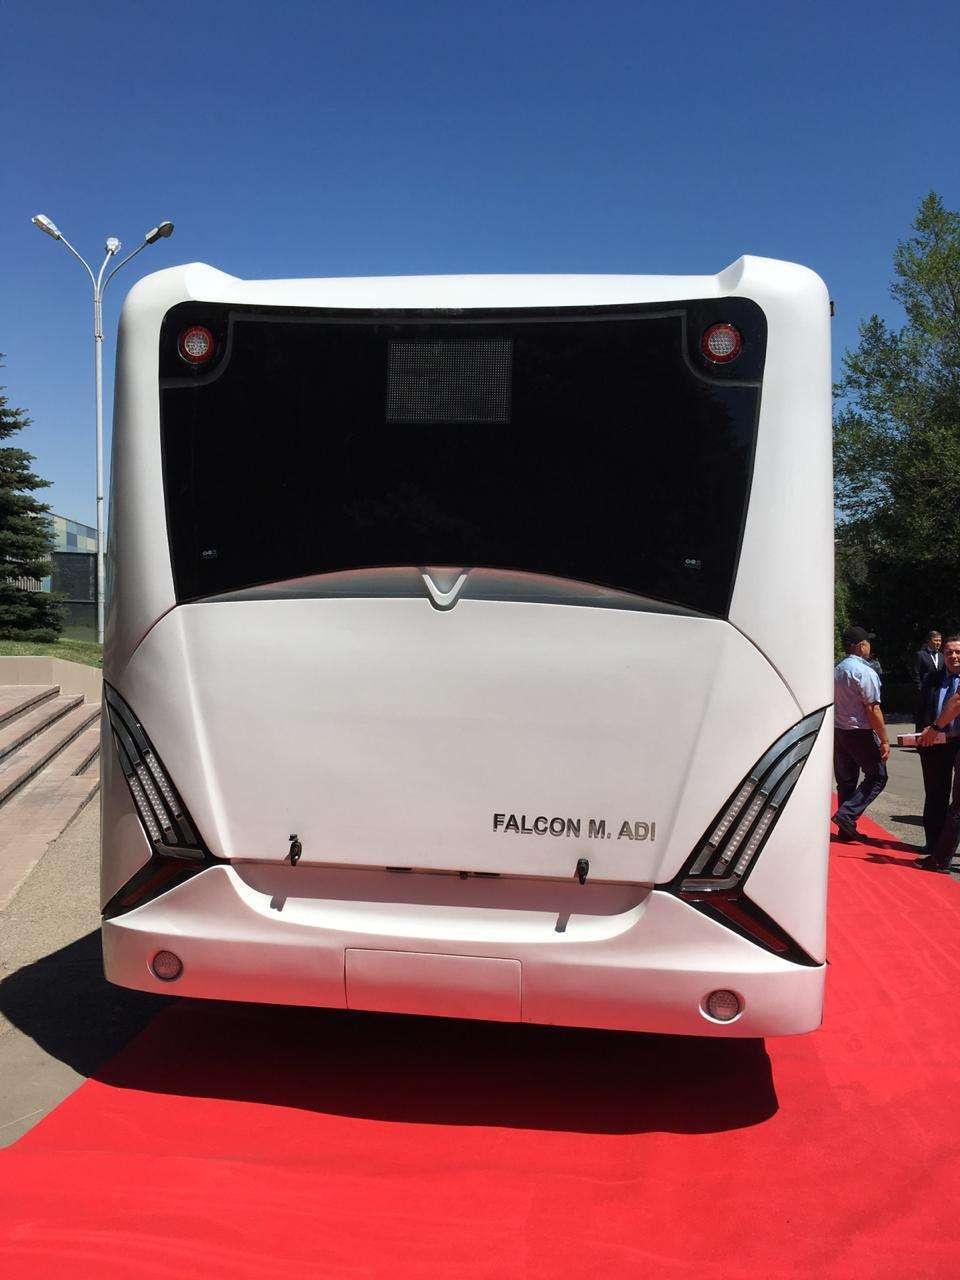 Название электробуса алматинского производства Falcon M.Adi